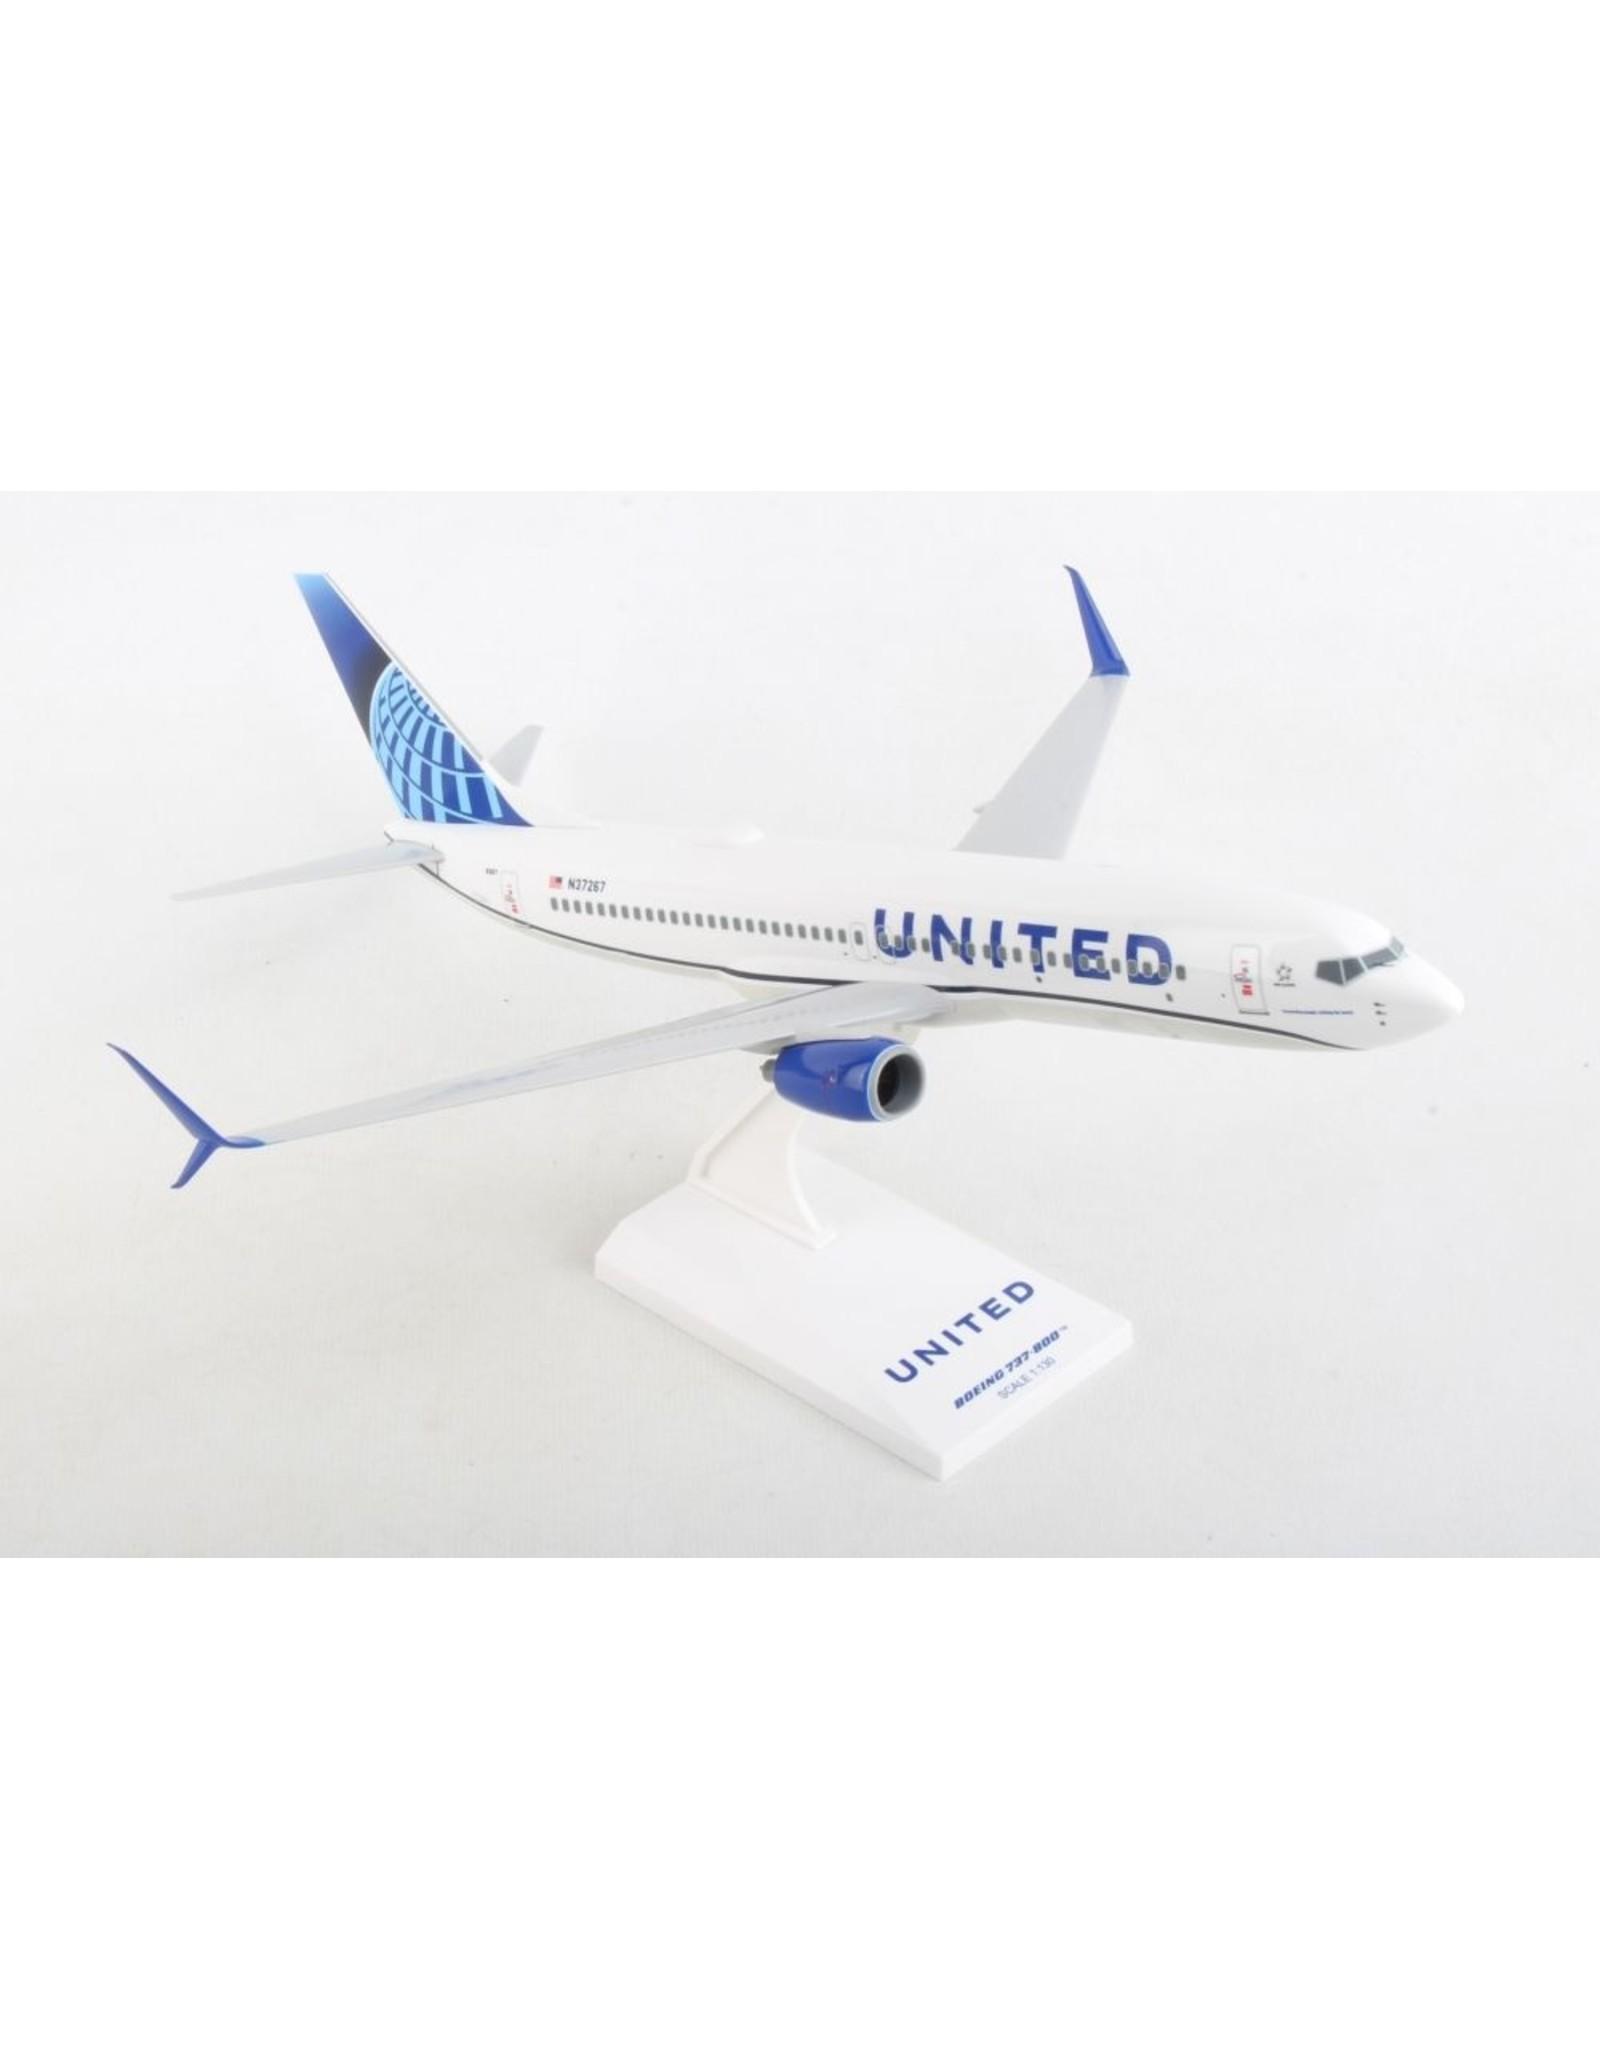 Skymarks Skymarks United 737-800 1/130 new